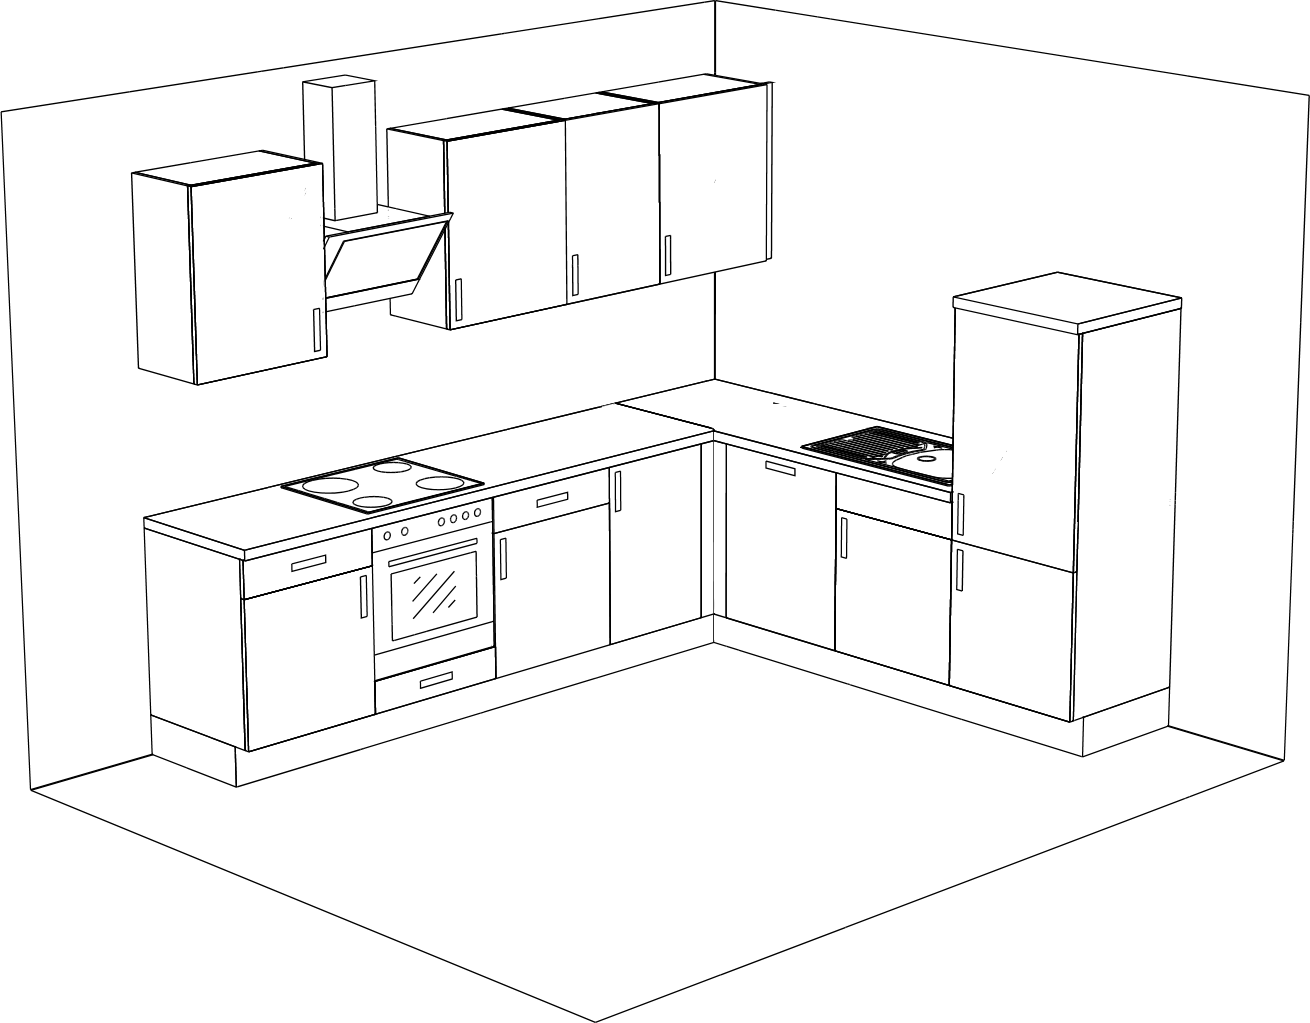 Full Size of Miele Küche Komplettküche Wohnzimmer Miele Komplettküche